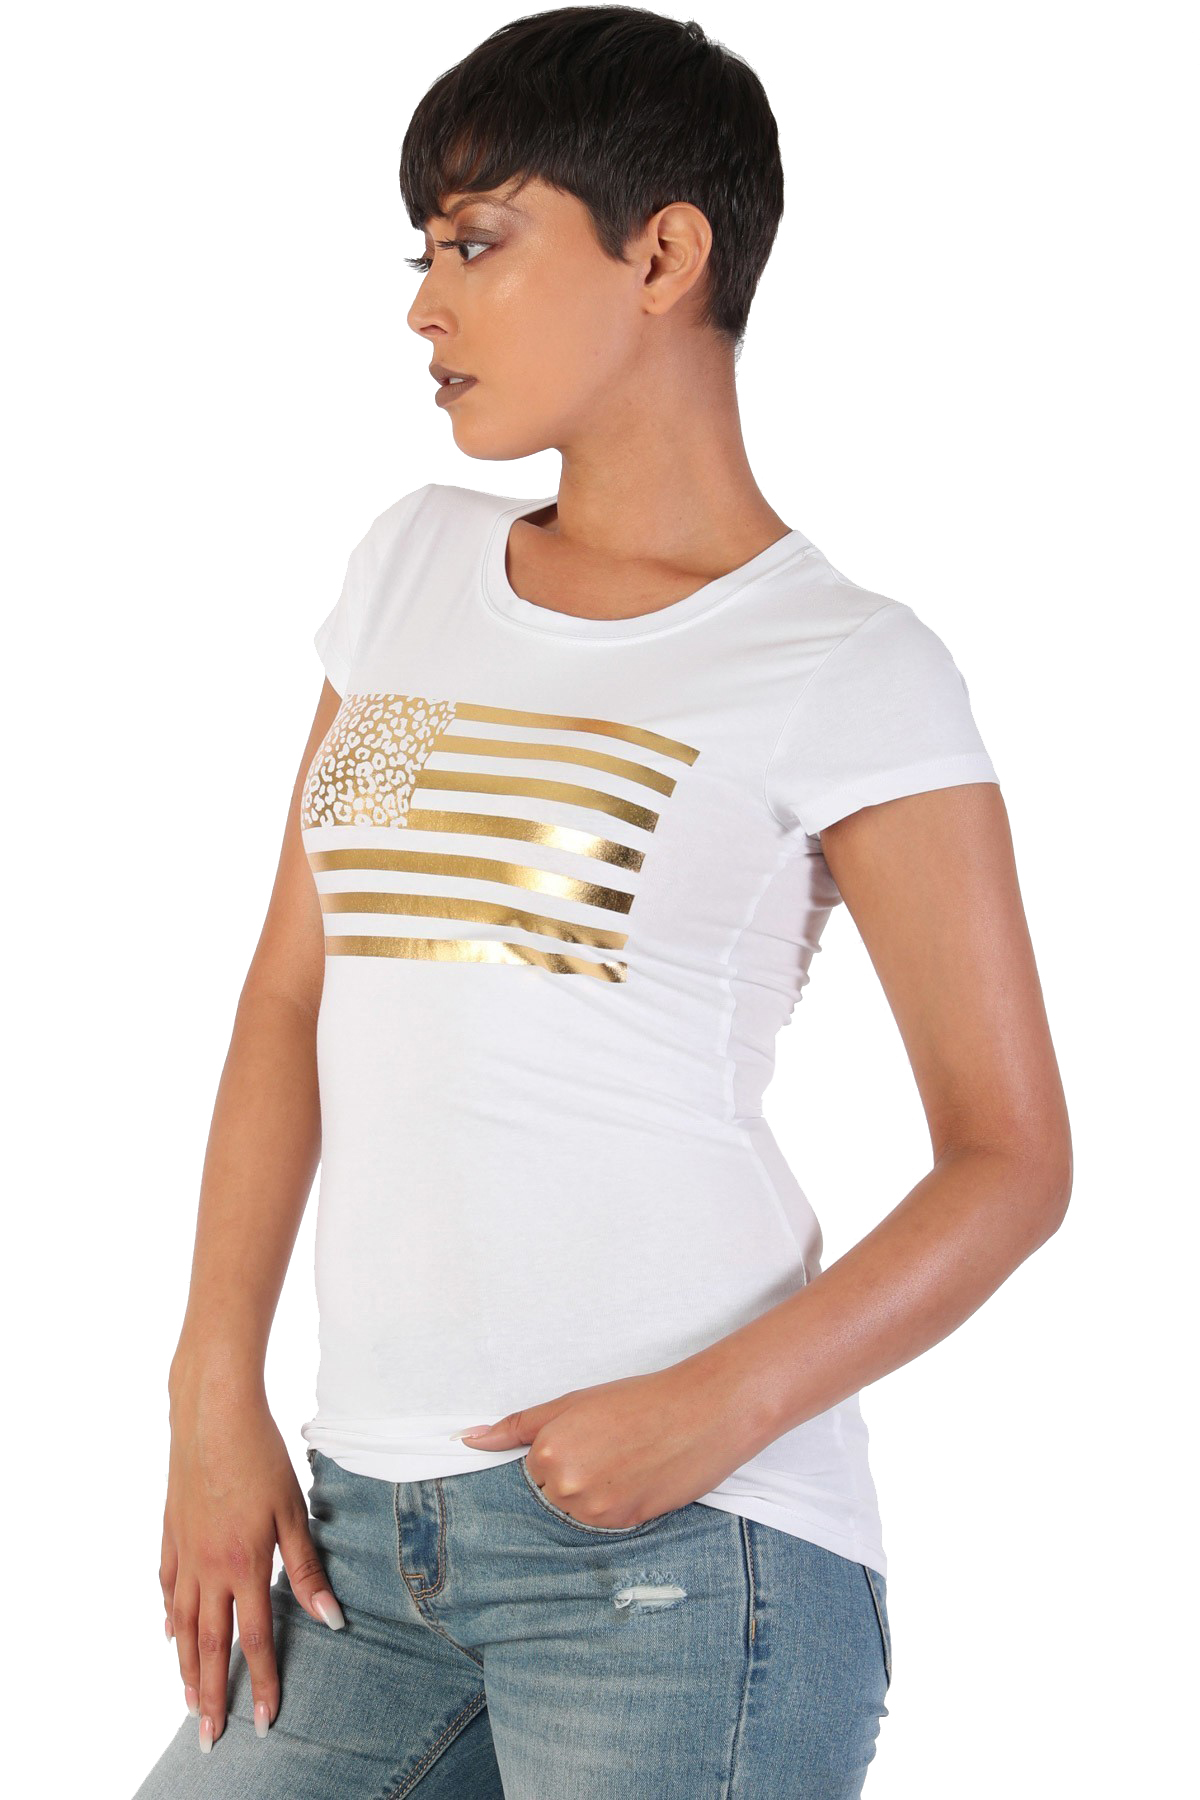 Women-039-s-Juniors-Patriotic-Casual-Graphic-Print-Short-Sleeve-T-Shirt-Top thumbnail 11